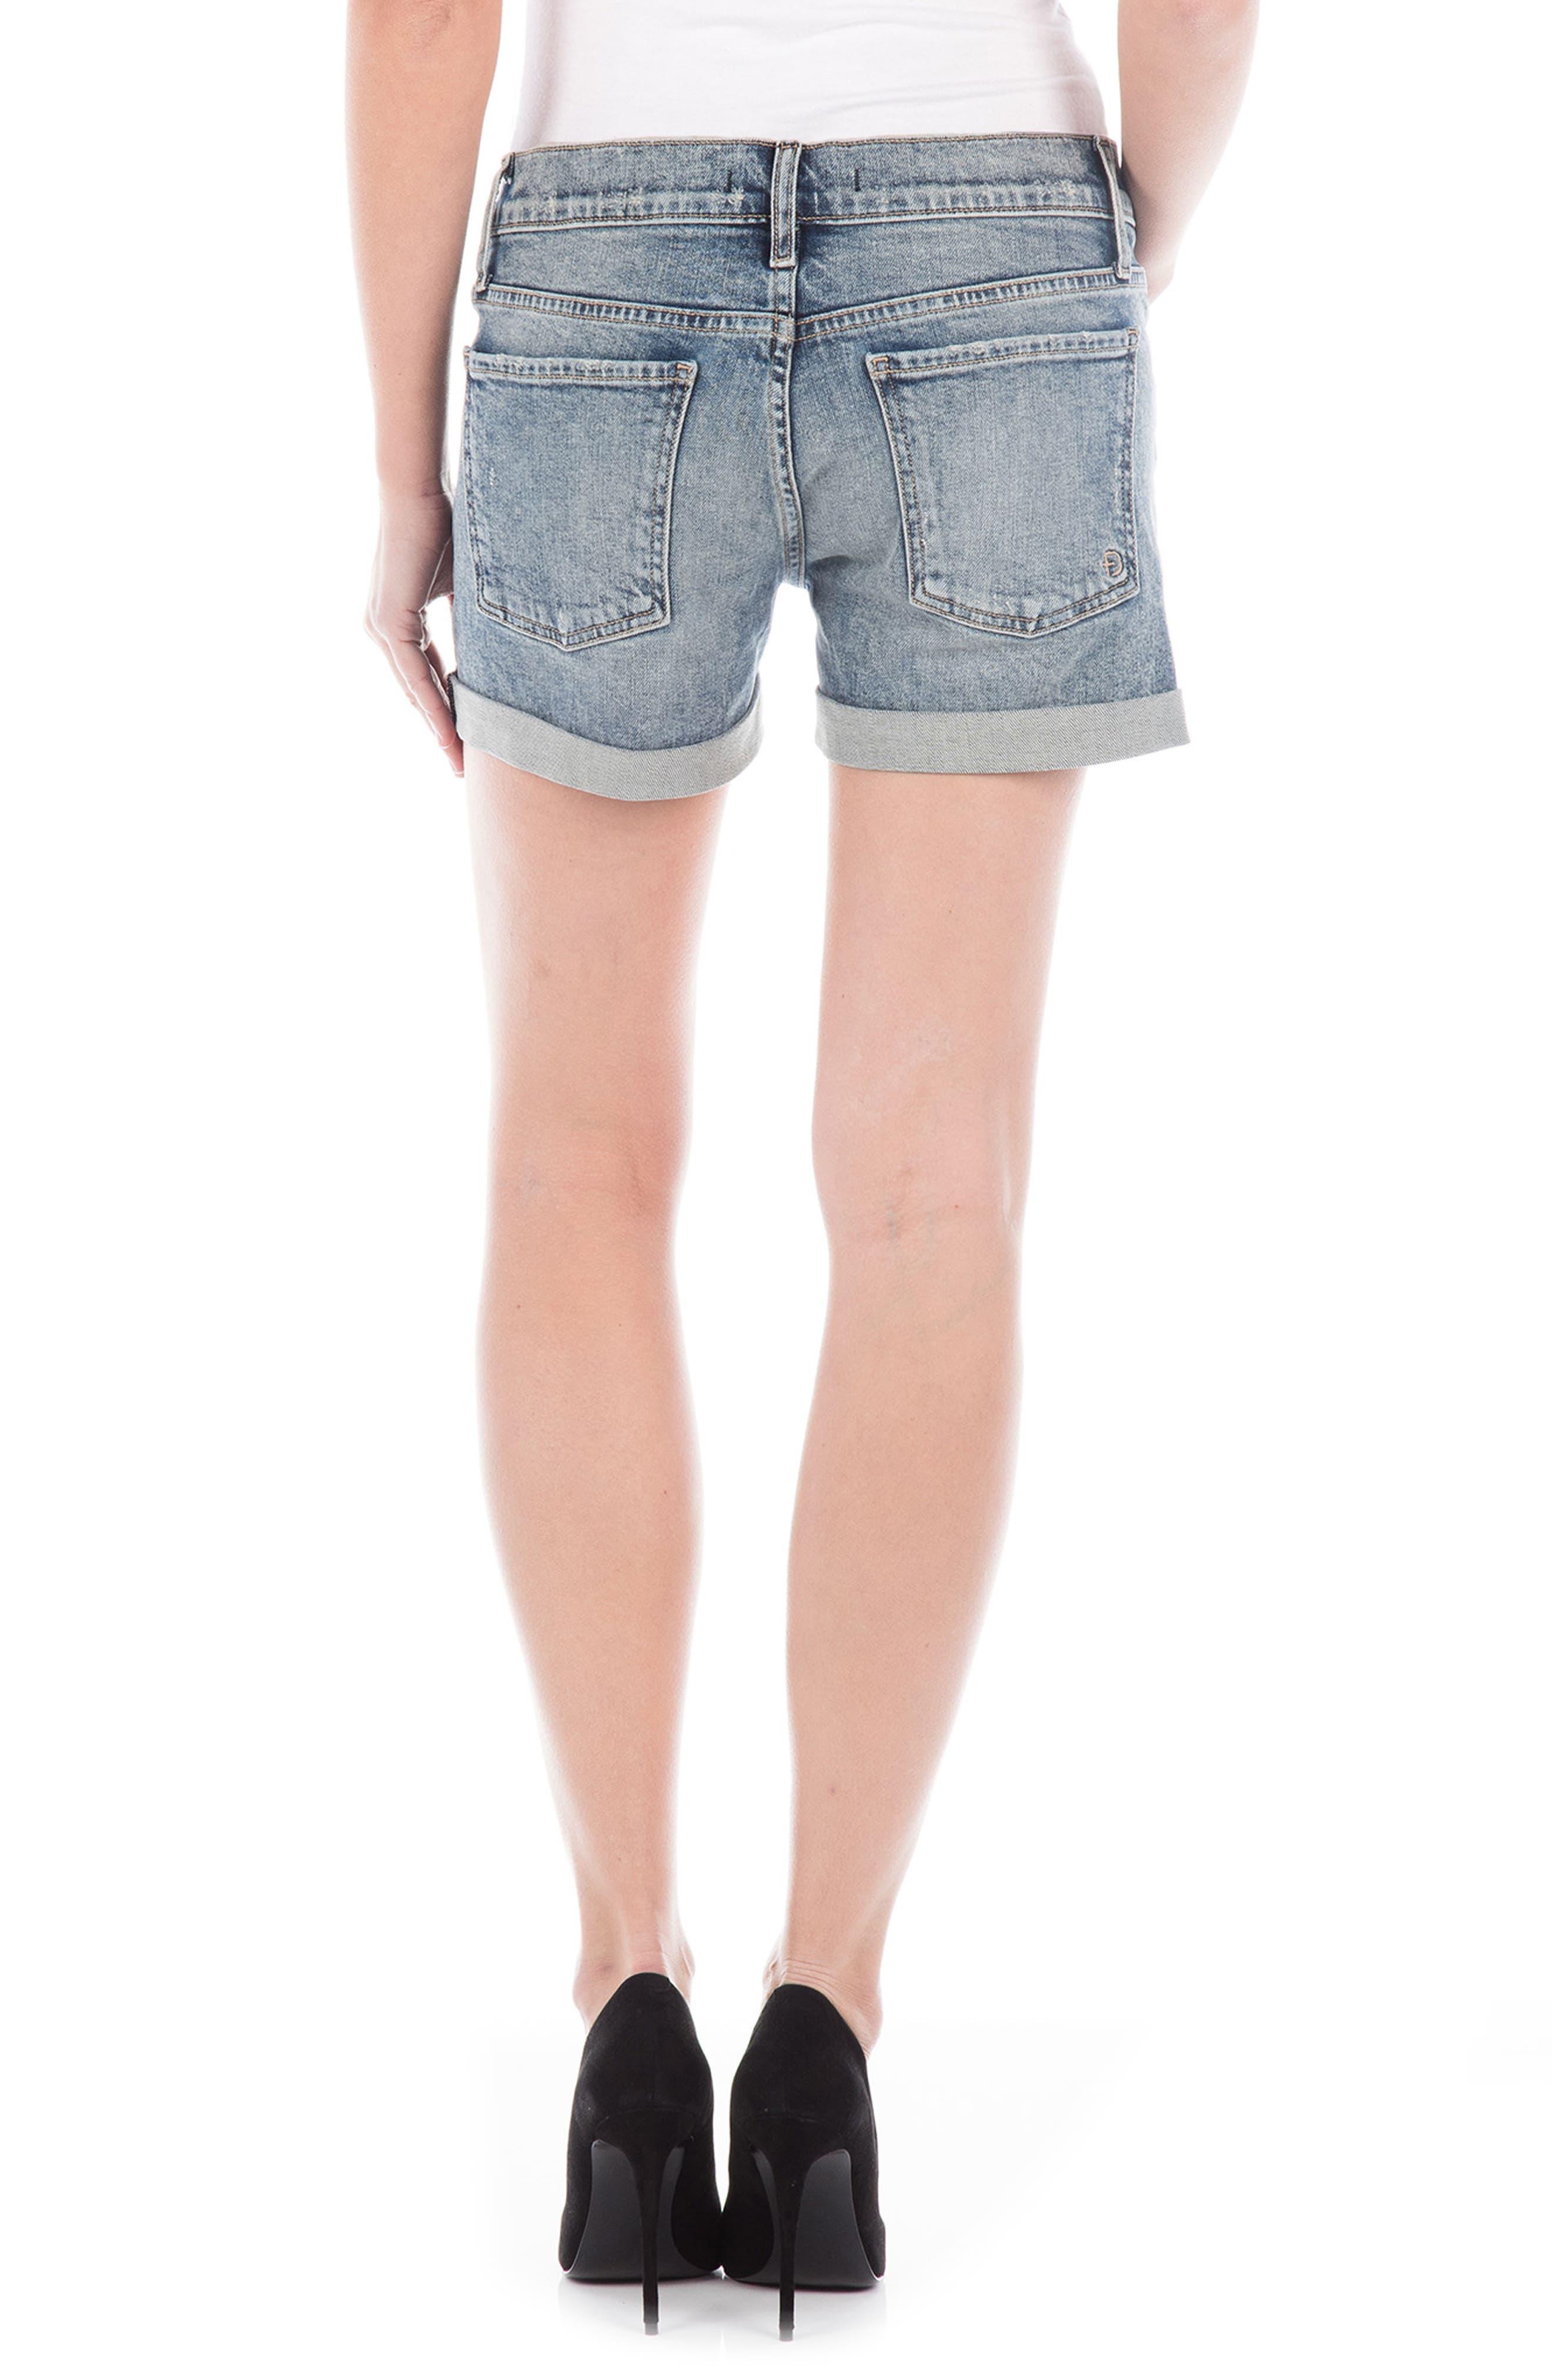 Malibu Denim Shorts,                             Alternate thumbnail 2, color,                             Bondai